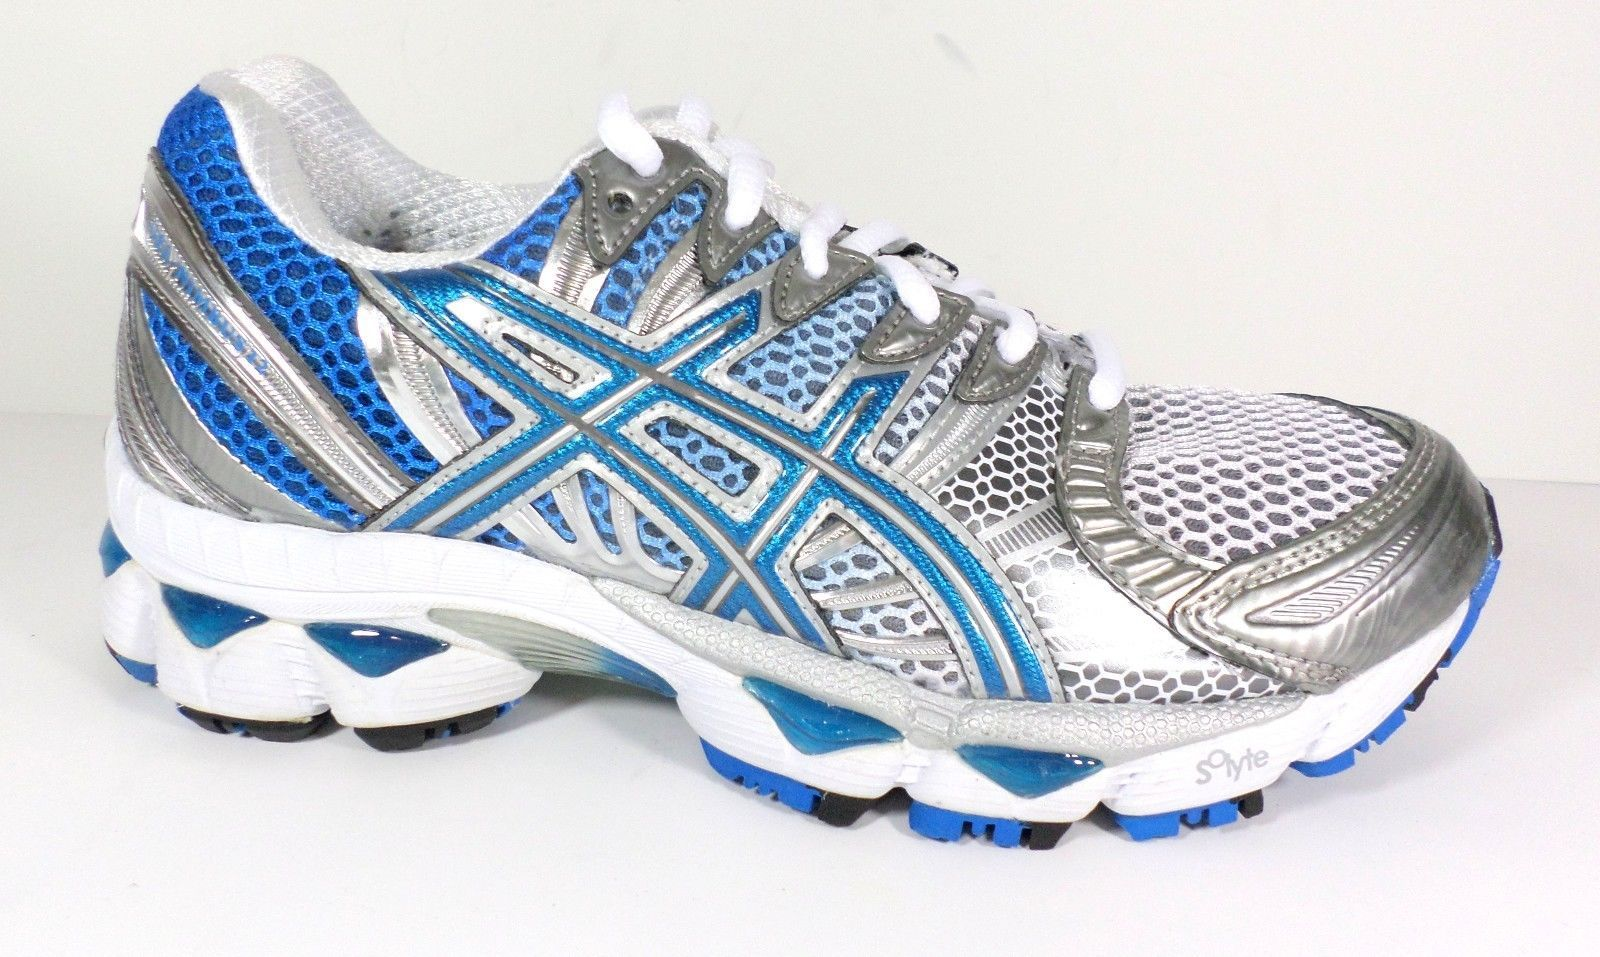 Asics Women's Running Shoes GEL-Nimbus 12 Titanium/Maui Blue/Lightning